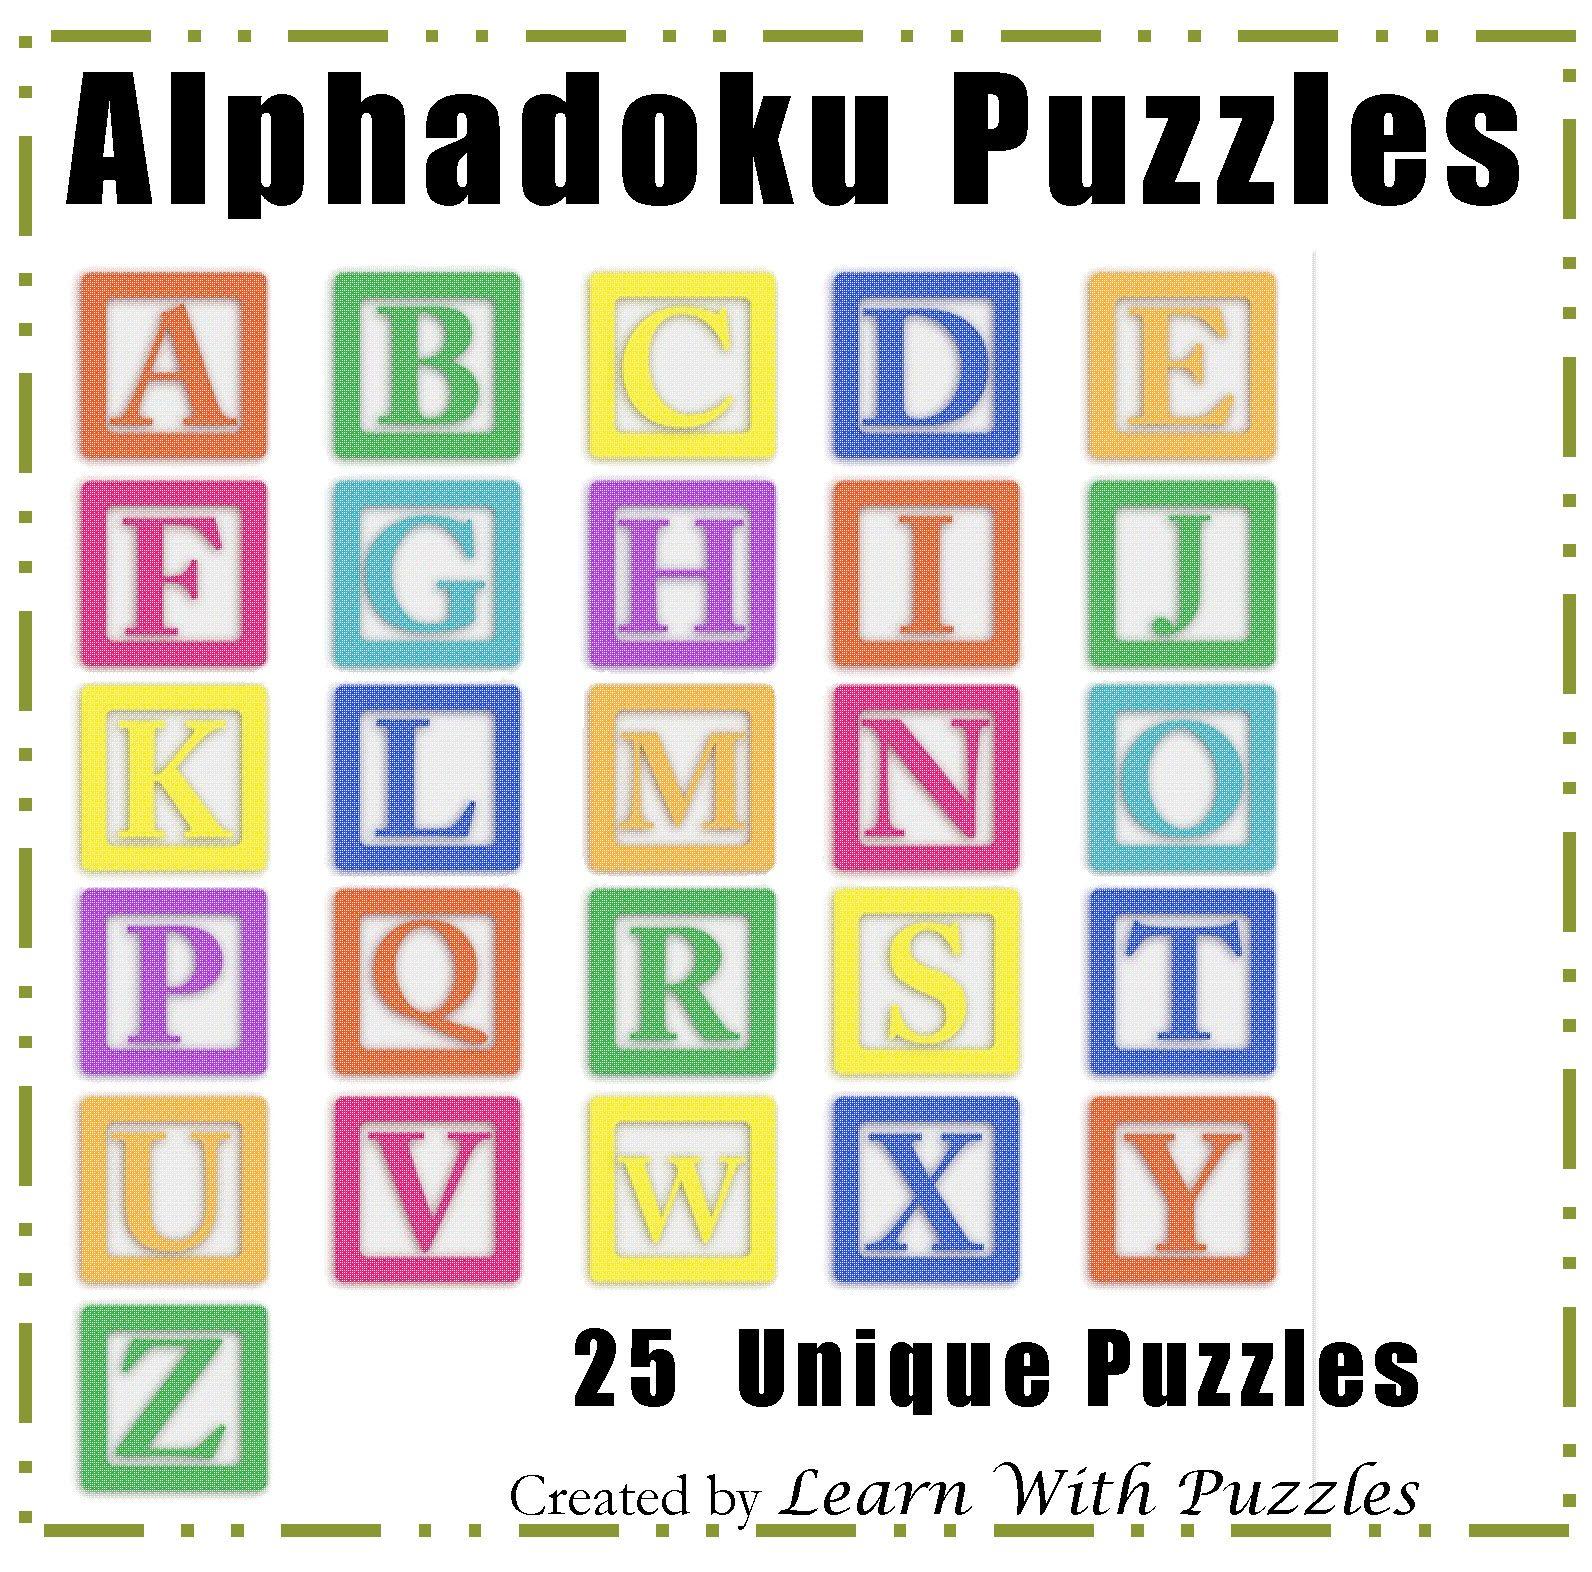 Alphadoku Puzzle Collection 25 UNIQUE Alphadoku Puzzle